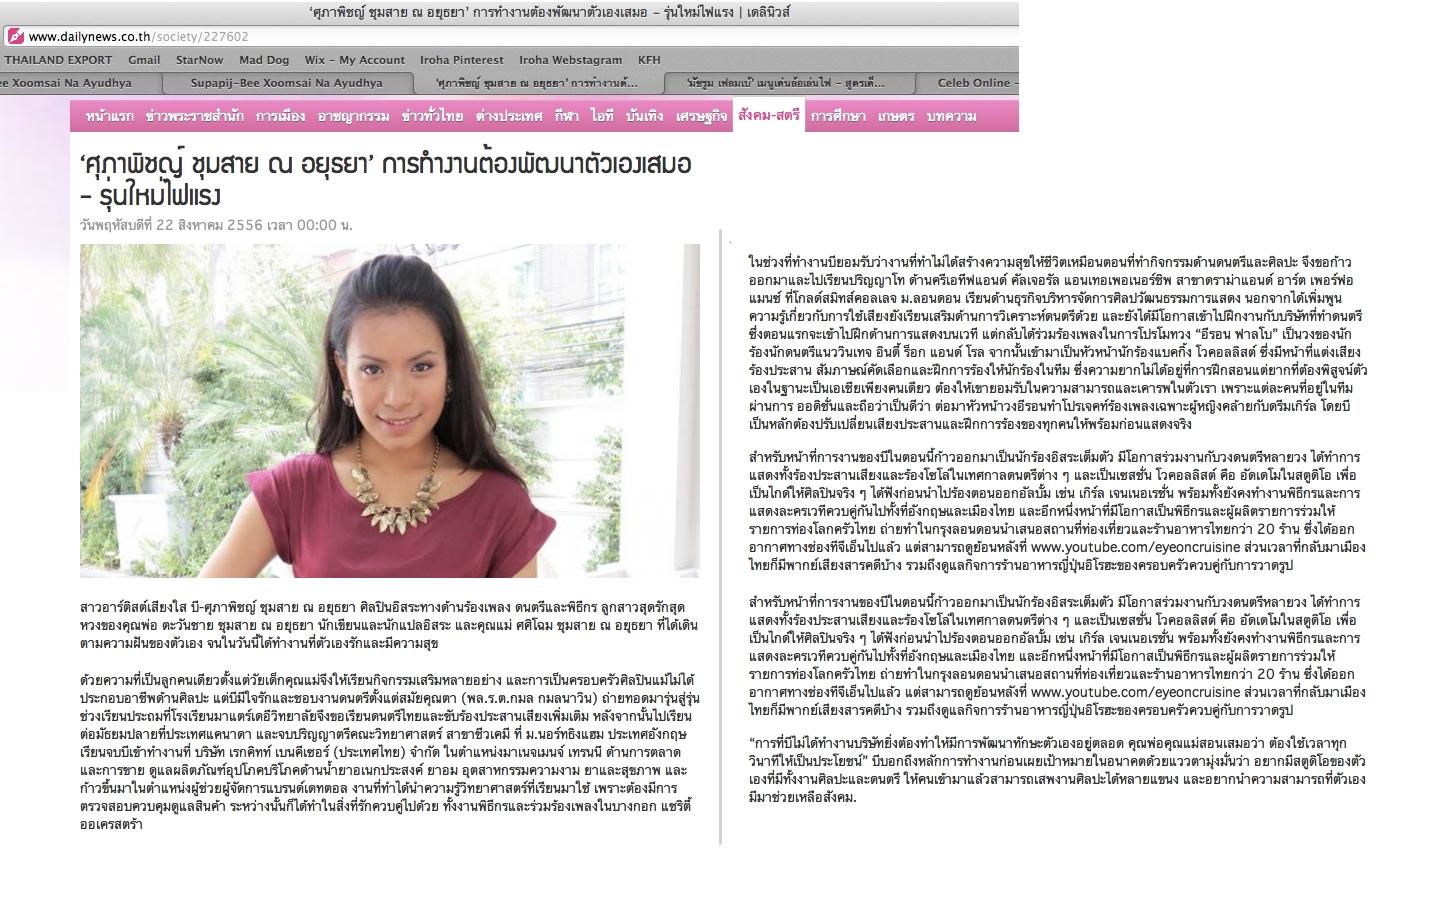 Dailynews Interview August 2013